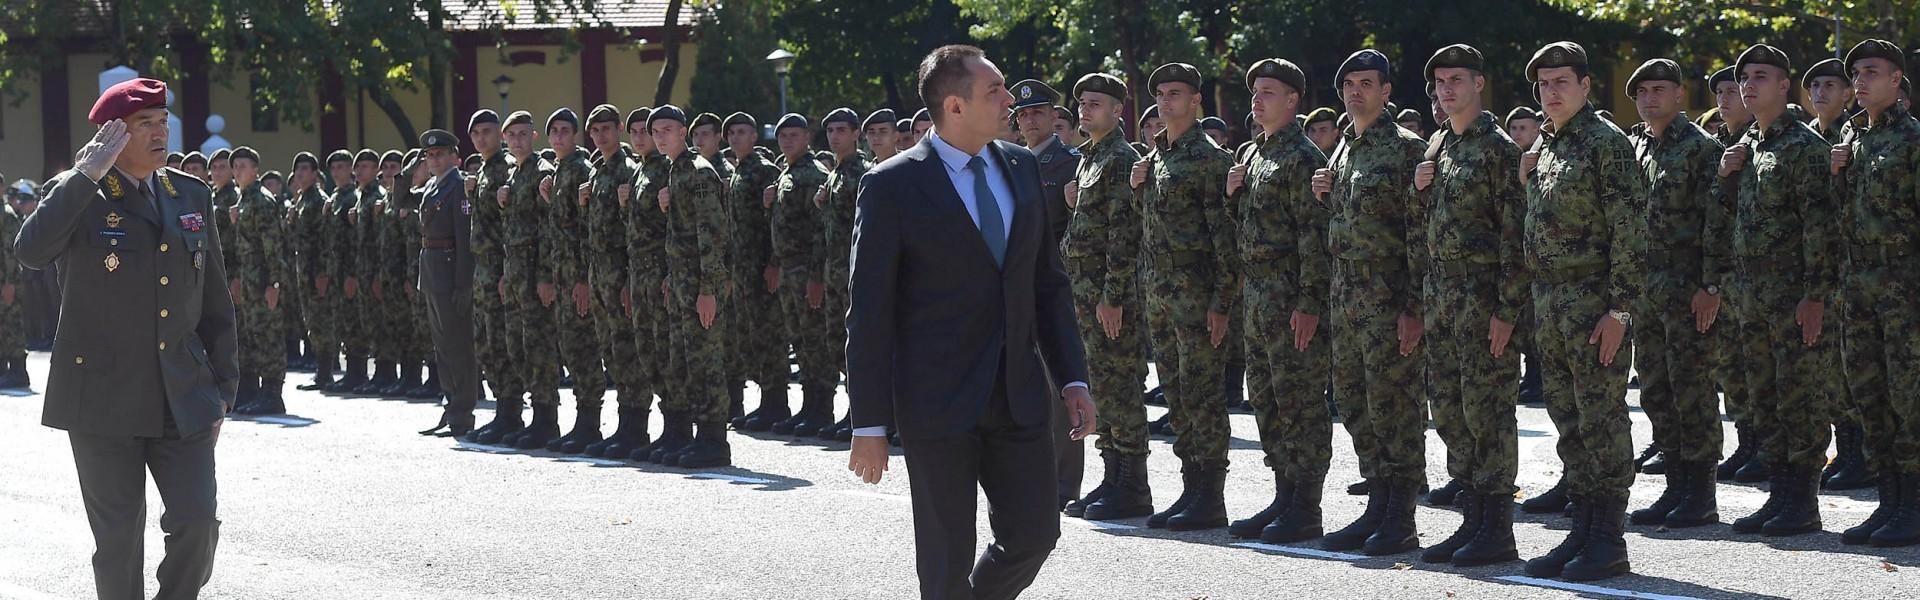 Ministar Vulin: Vojska je naš bedem od svakog zla, zločina i oluje